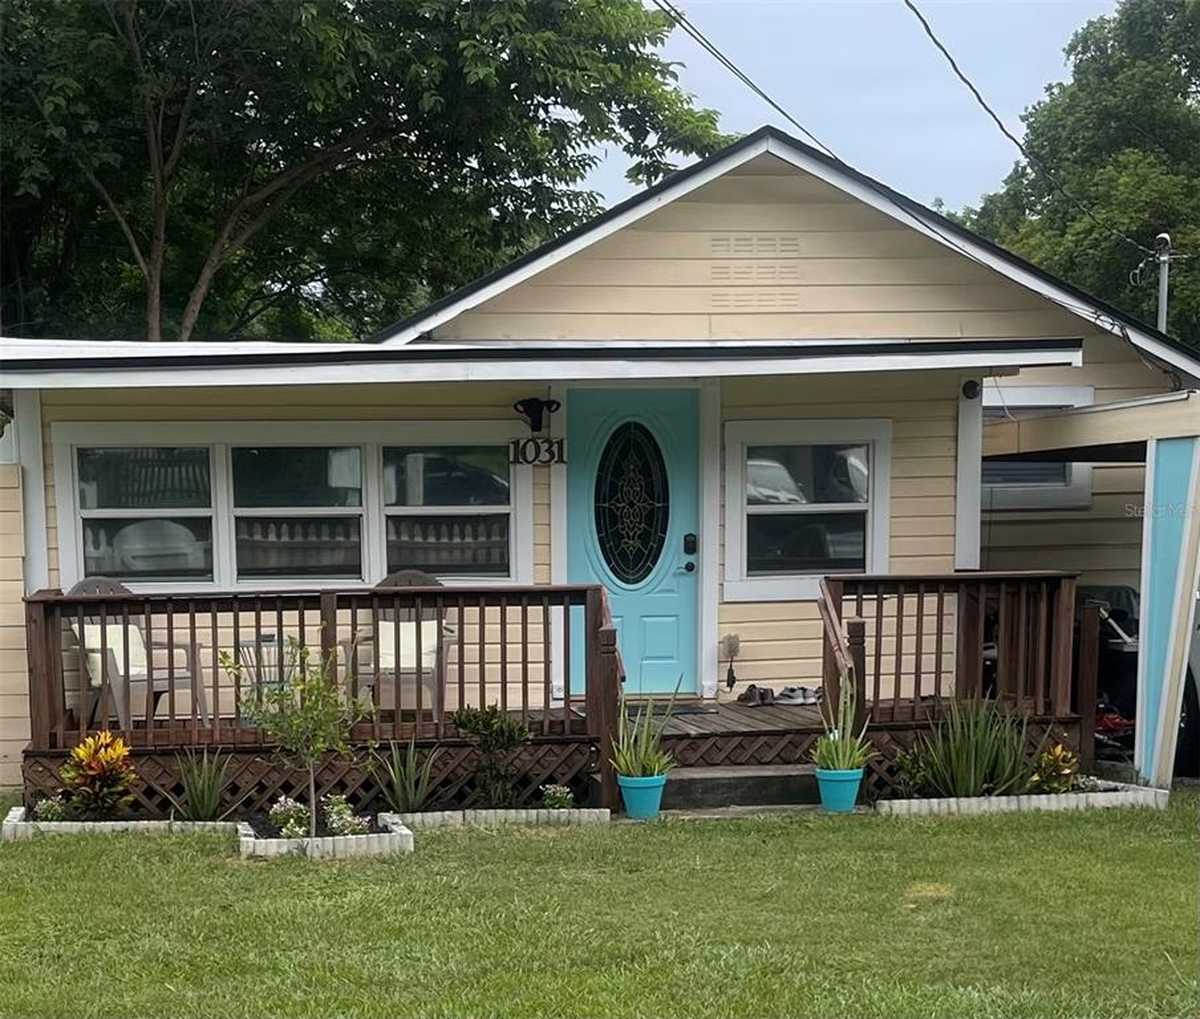 $215,000 - 3Br/2Ba -  for Sale in Angebilt Add, Orlando